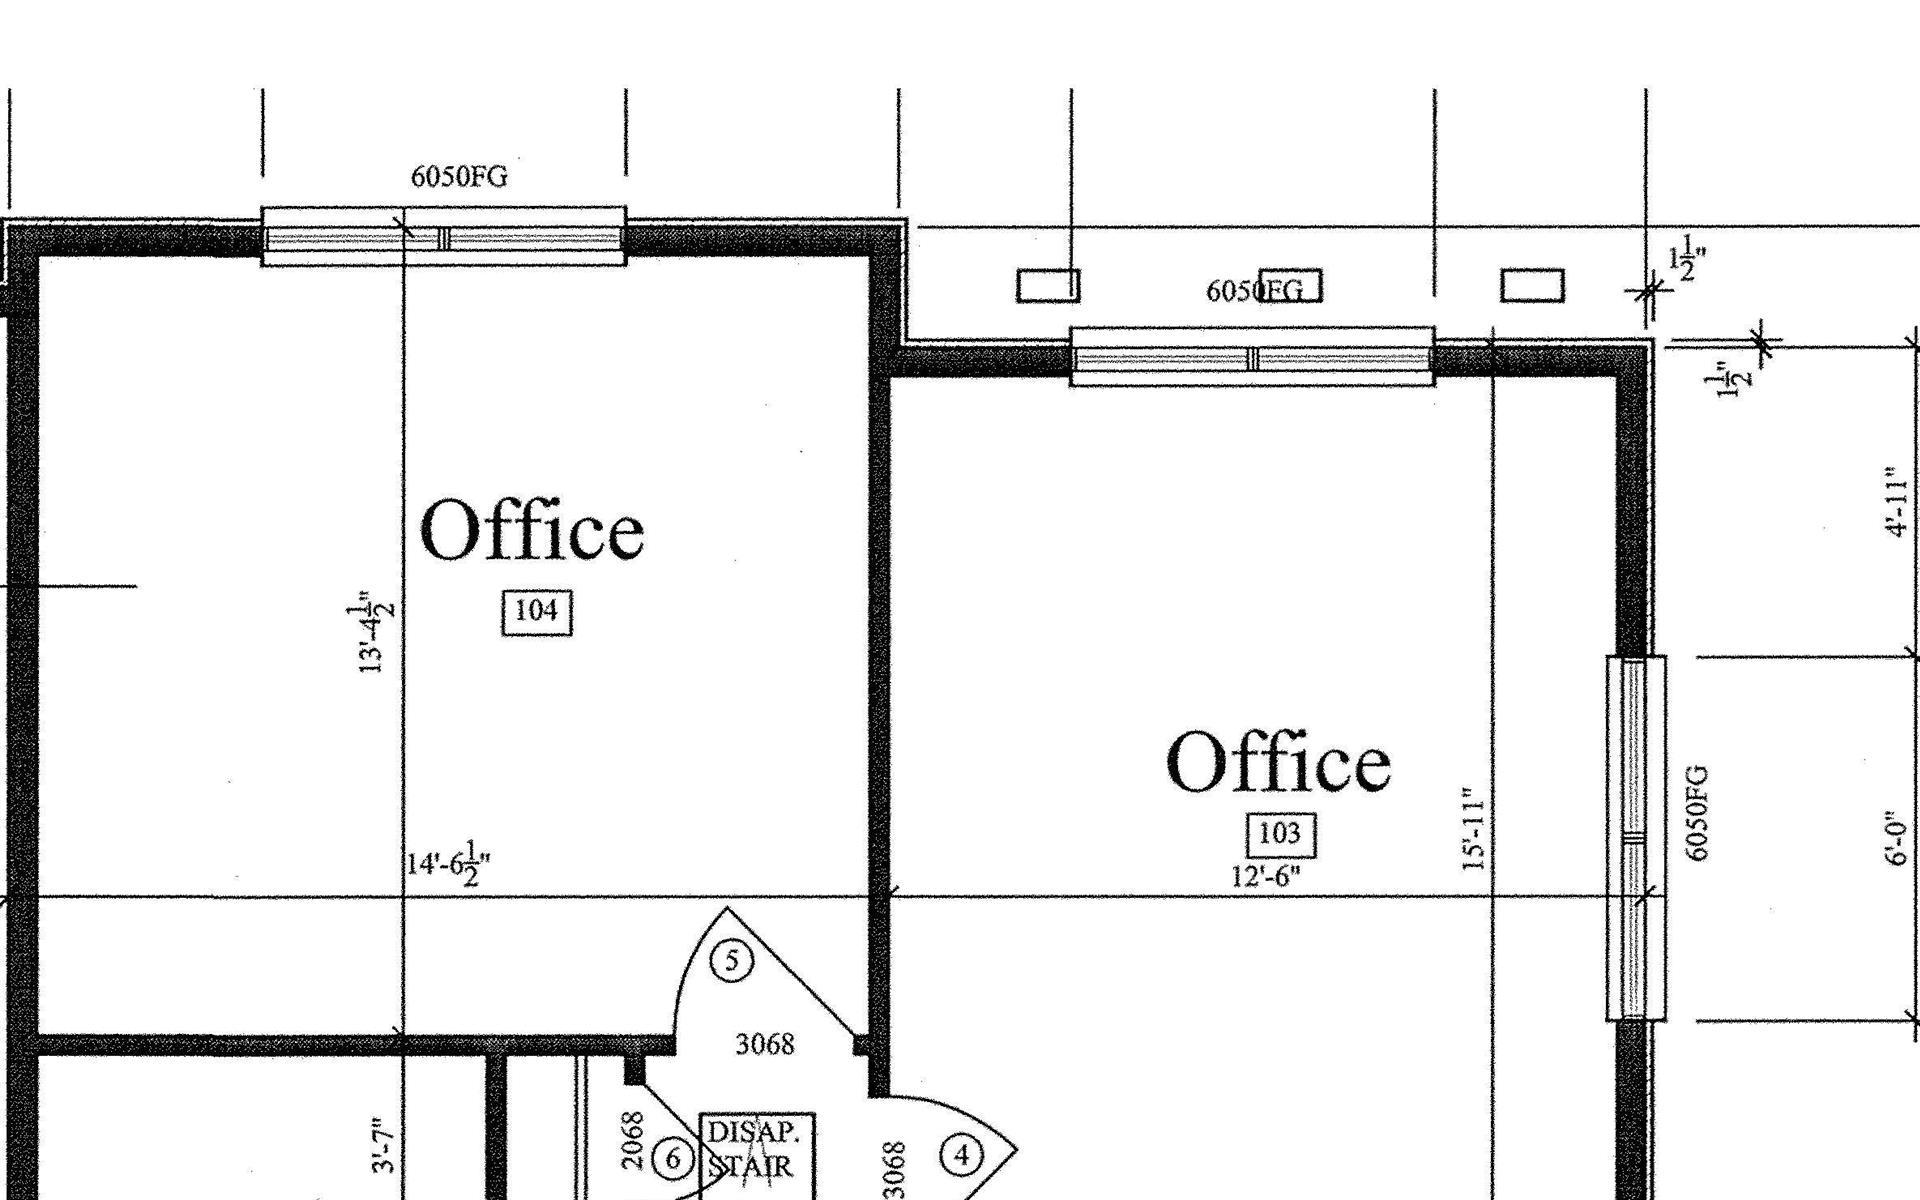 Zreyas - Office 1